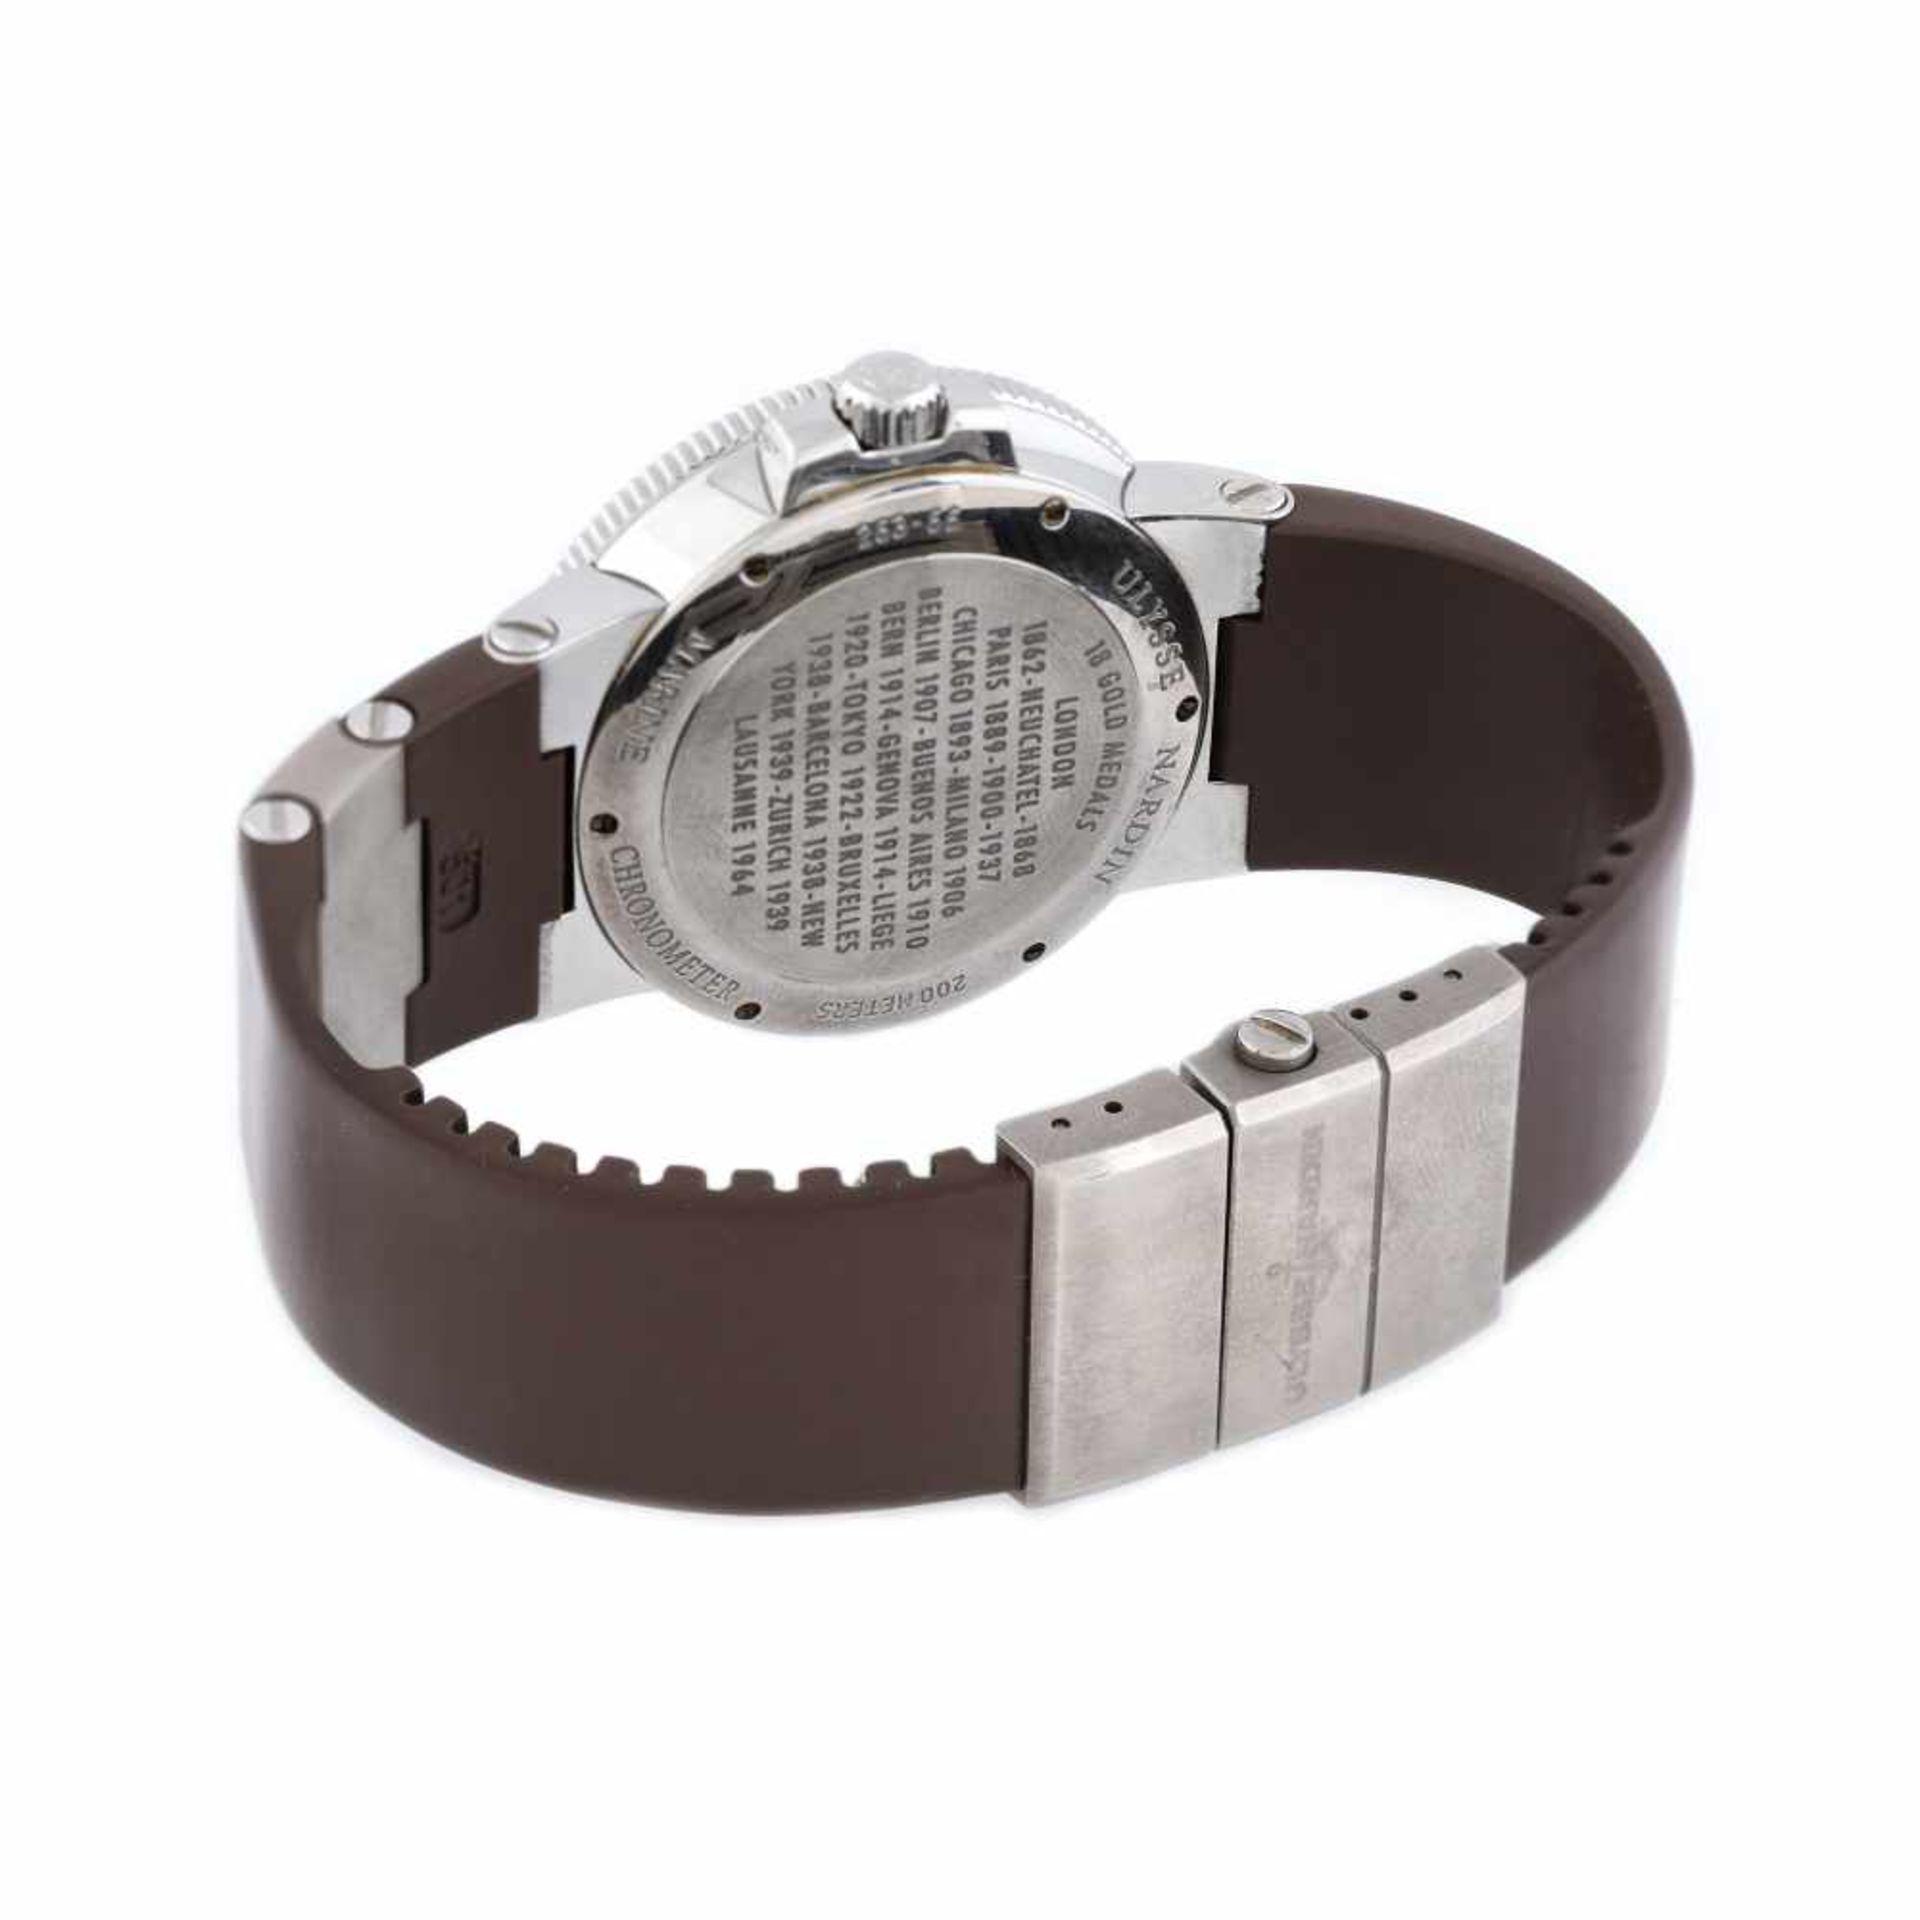 Ulysse Nardin Maxi Marine Chronometer wristwatch, men, provenance documents - Bild 3 aus 4